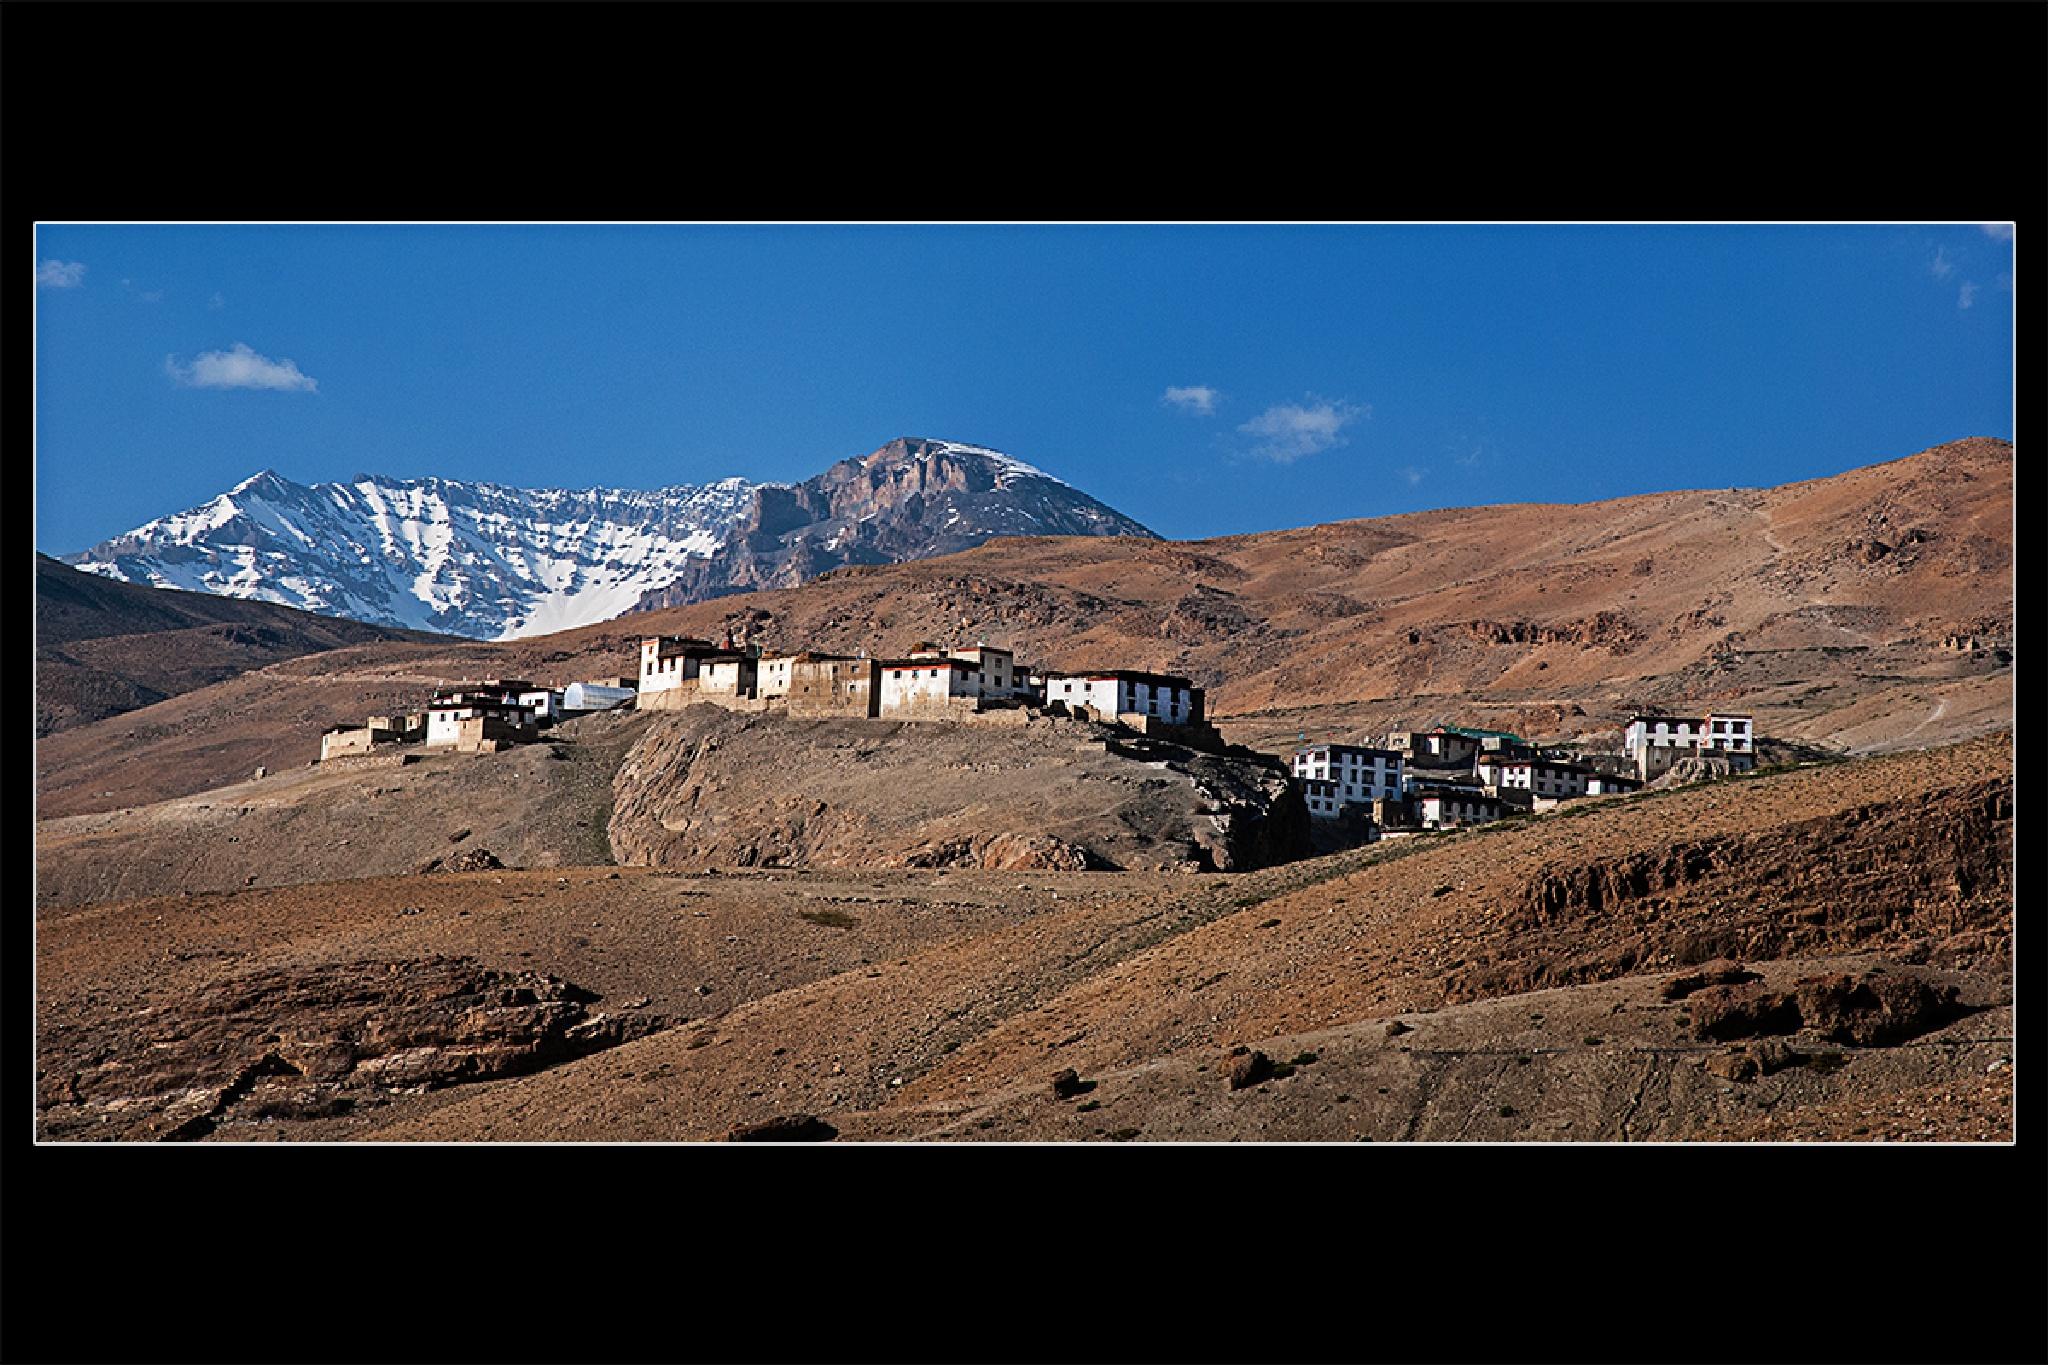 Spiti Valley by Saurabh Bhattacharyya